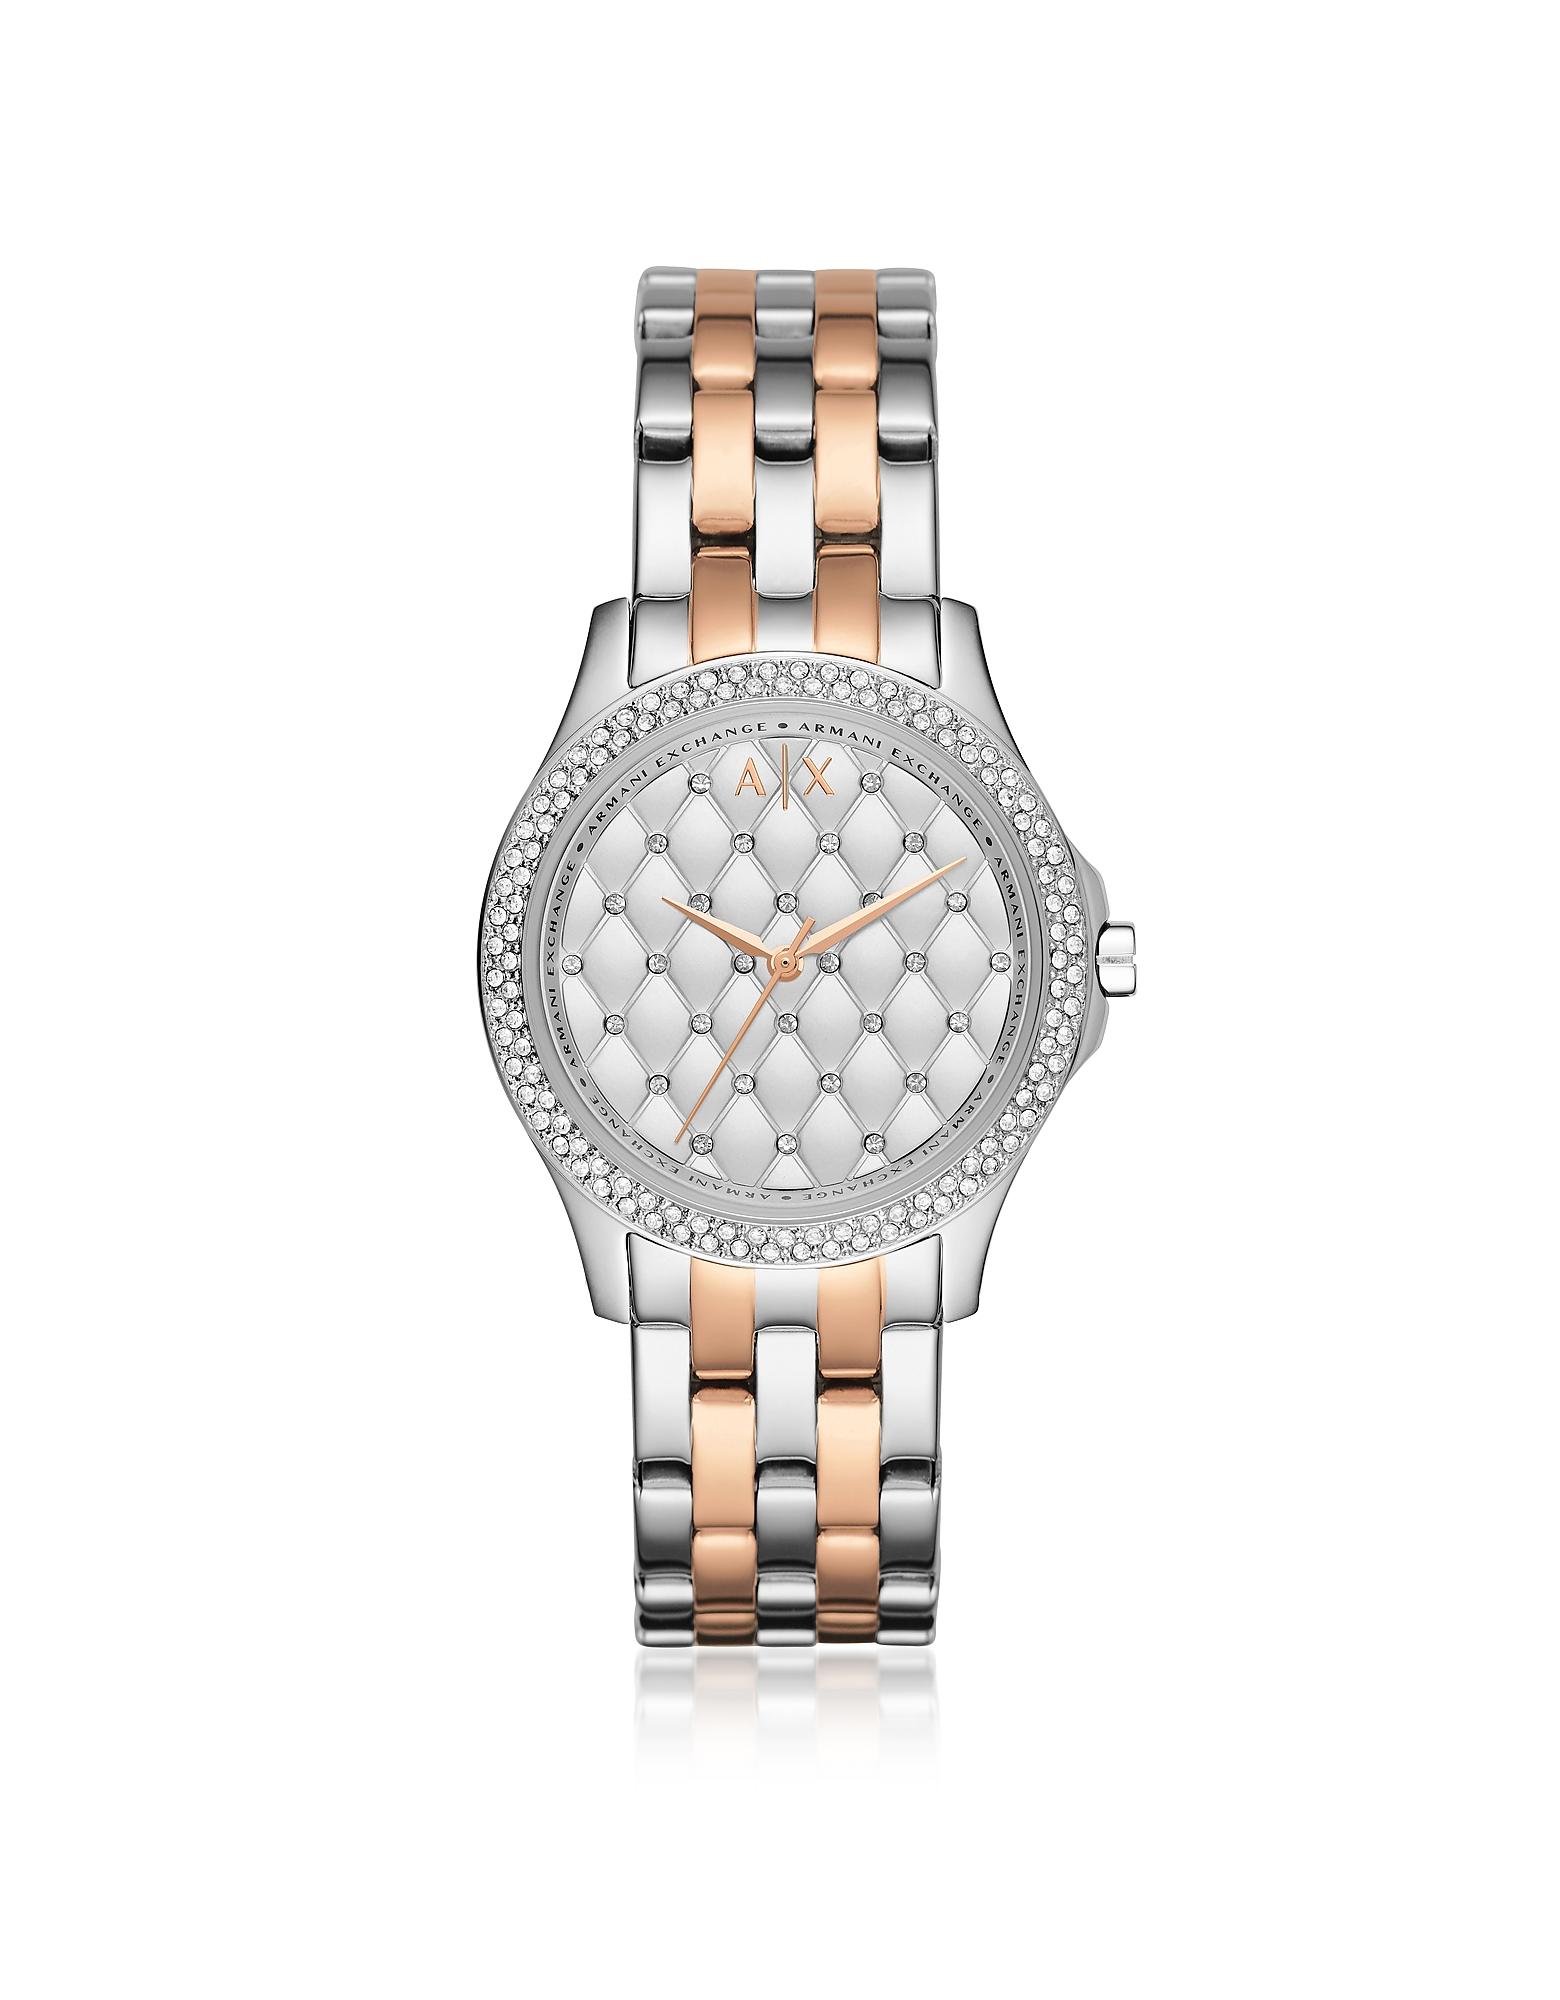 Armani Exchange Women's Watches, Lady Hampton Two Tone Women's Watch